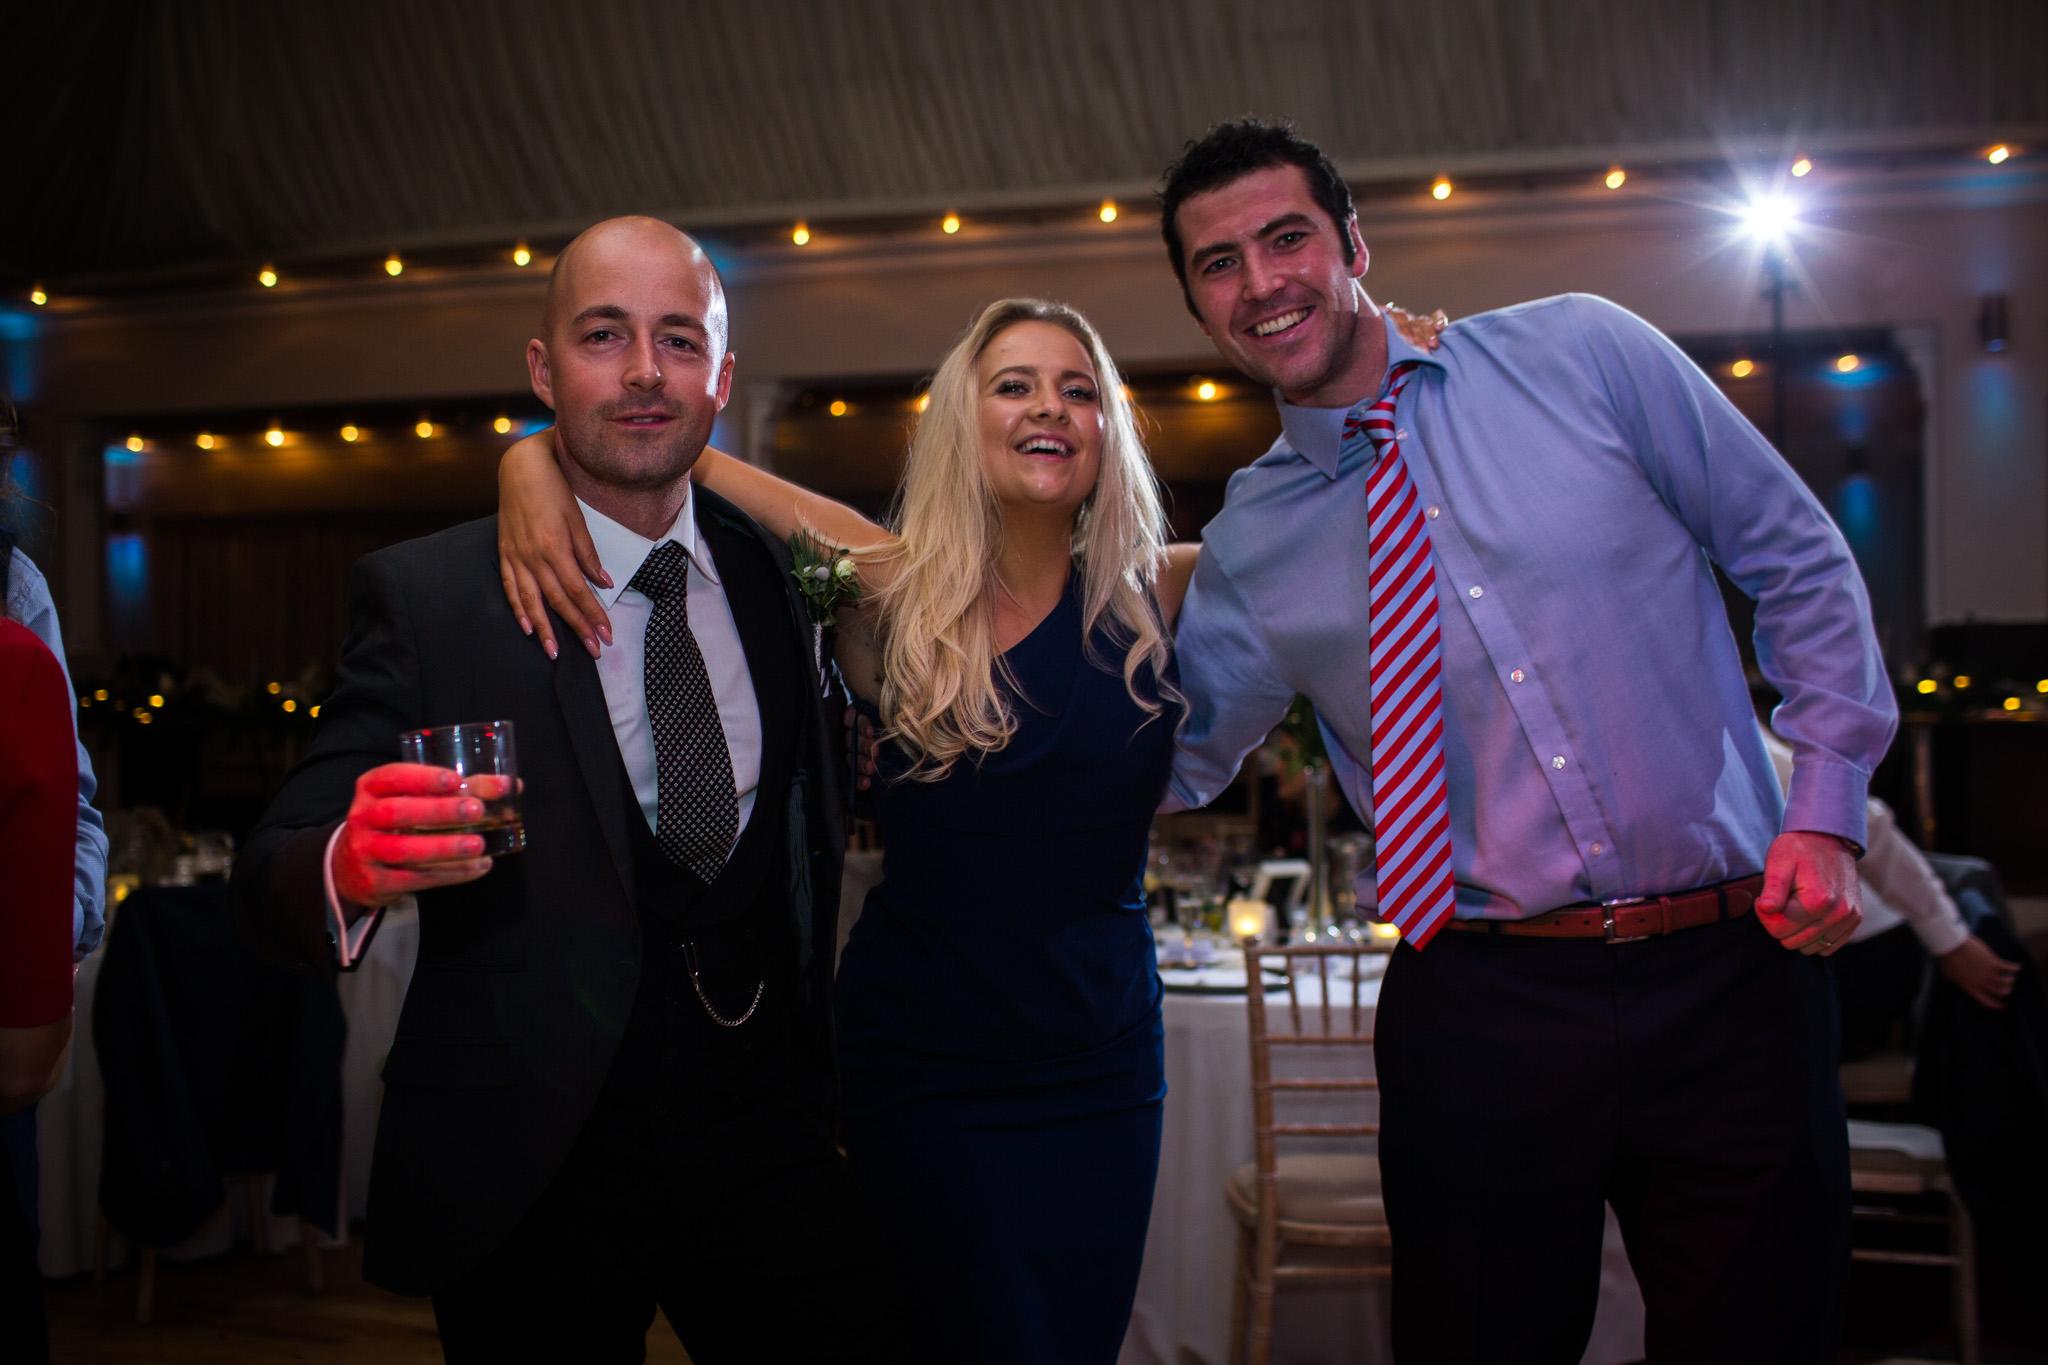 Mark_Barnes_Northern_Ireland_wedding_photographer_Harveys_Point_Donegall_Wedding_photography-Adam&Gemma-75.jpg